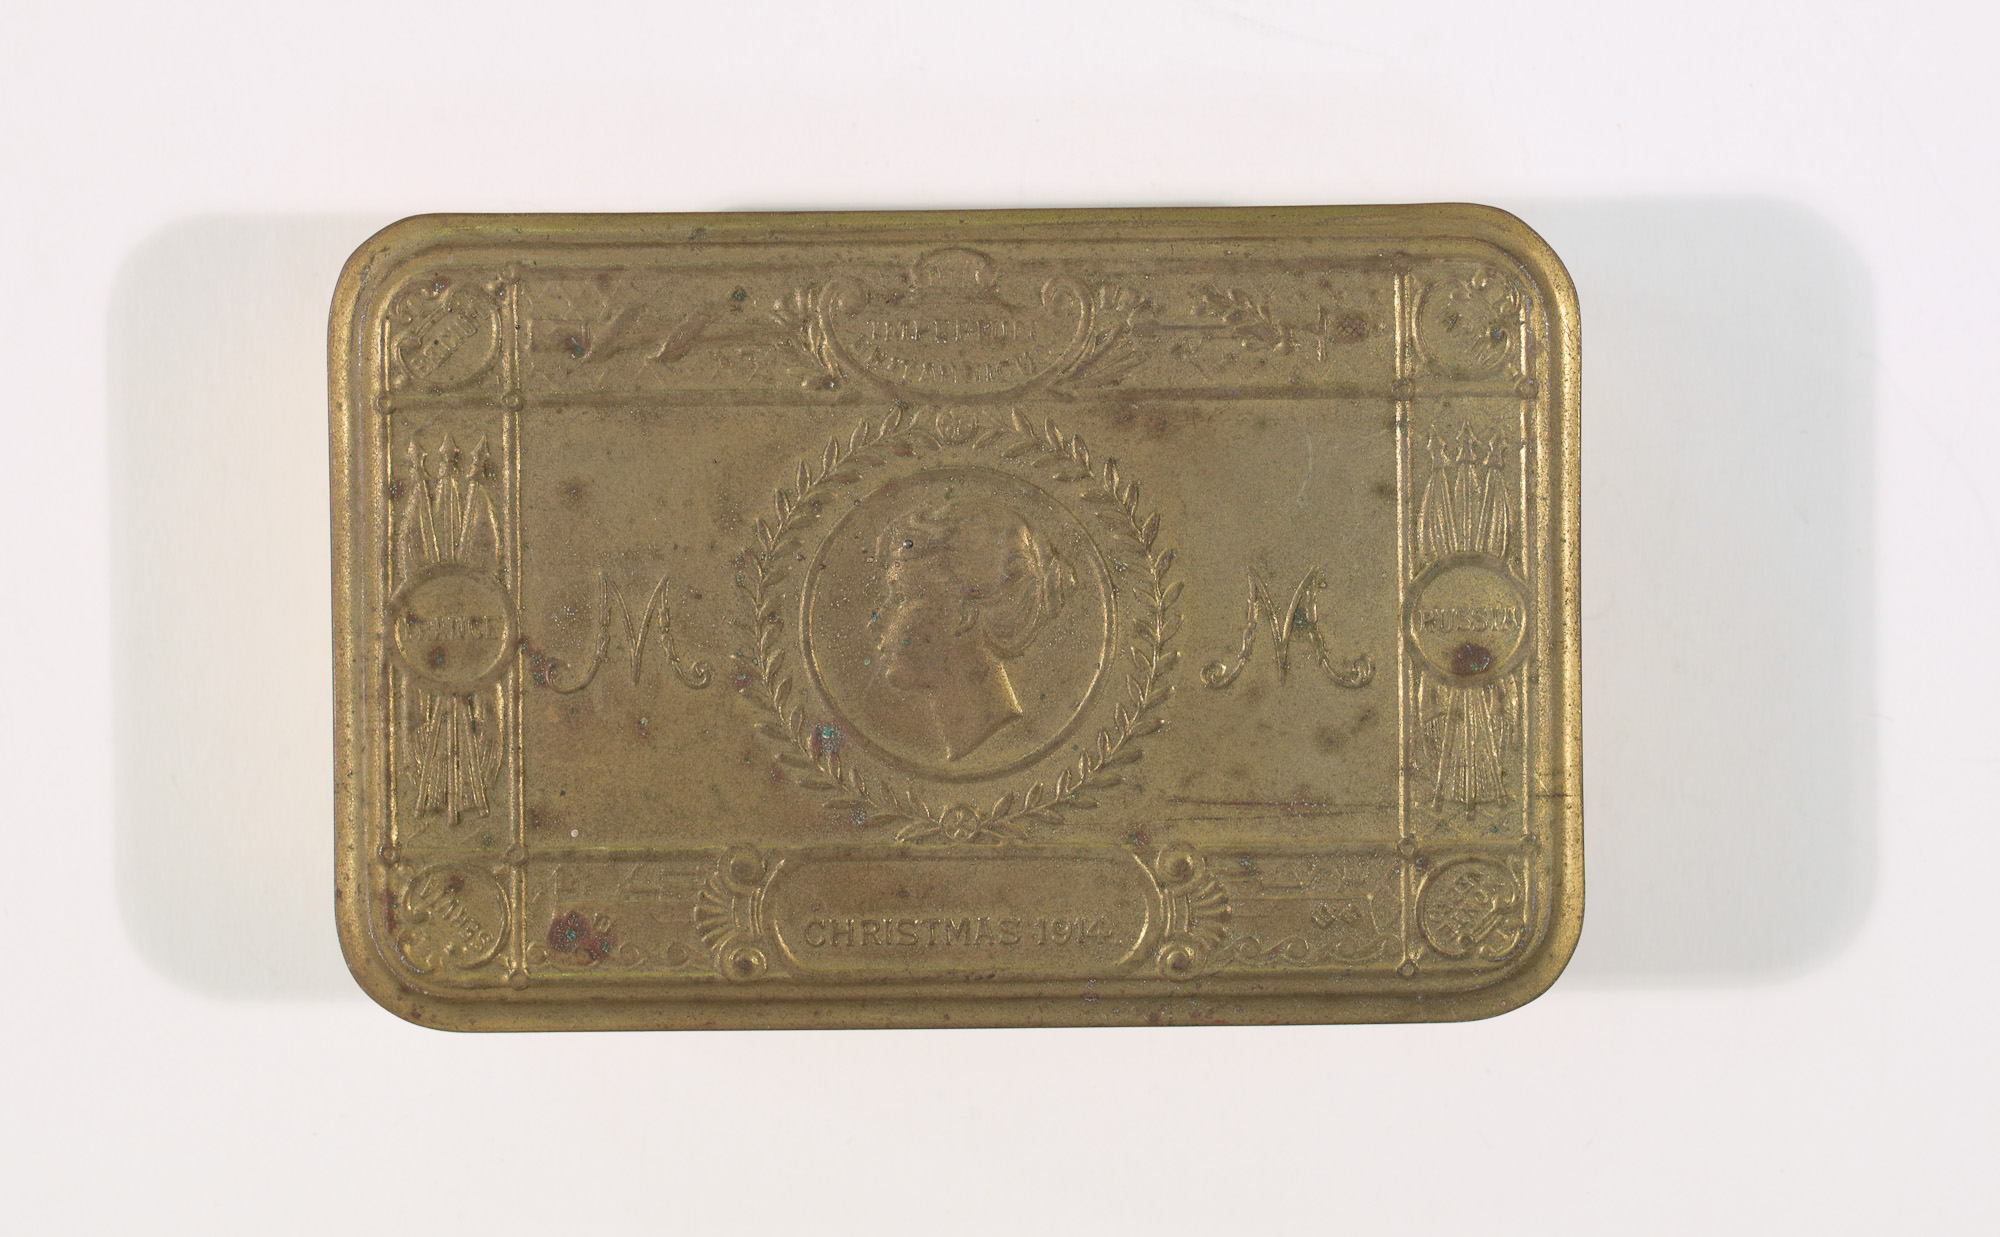 Princess Mary Christmas gift box - Wikipedia